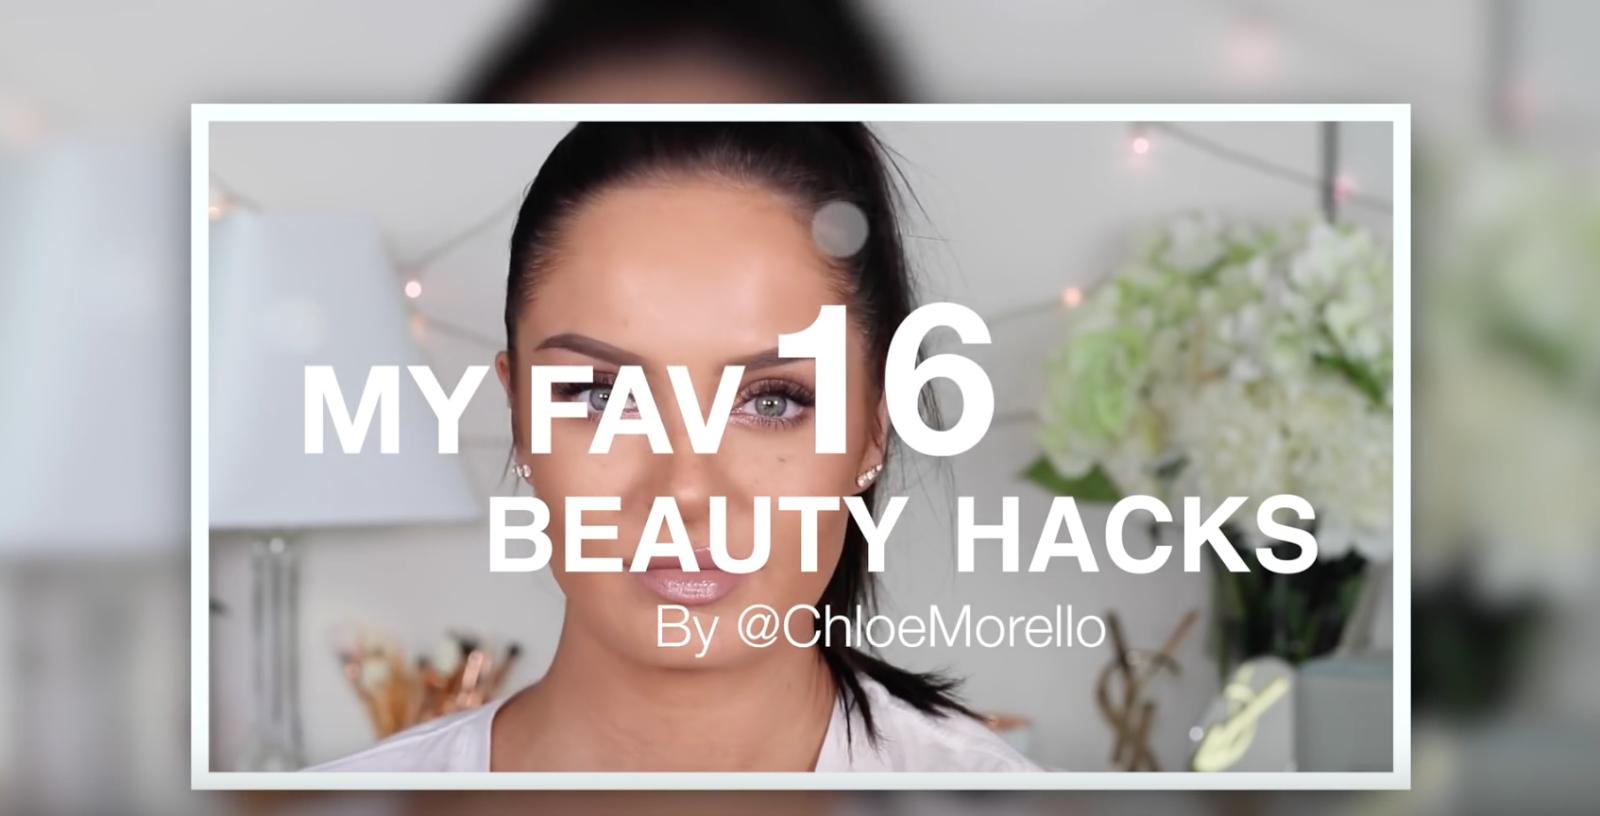 Chloe Morello: 16 Best Makeup and Beauty HACKS 2017